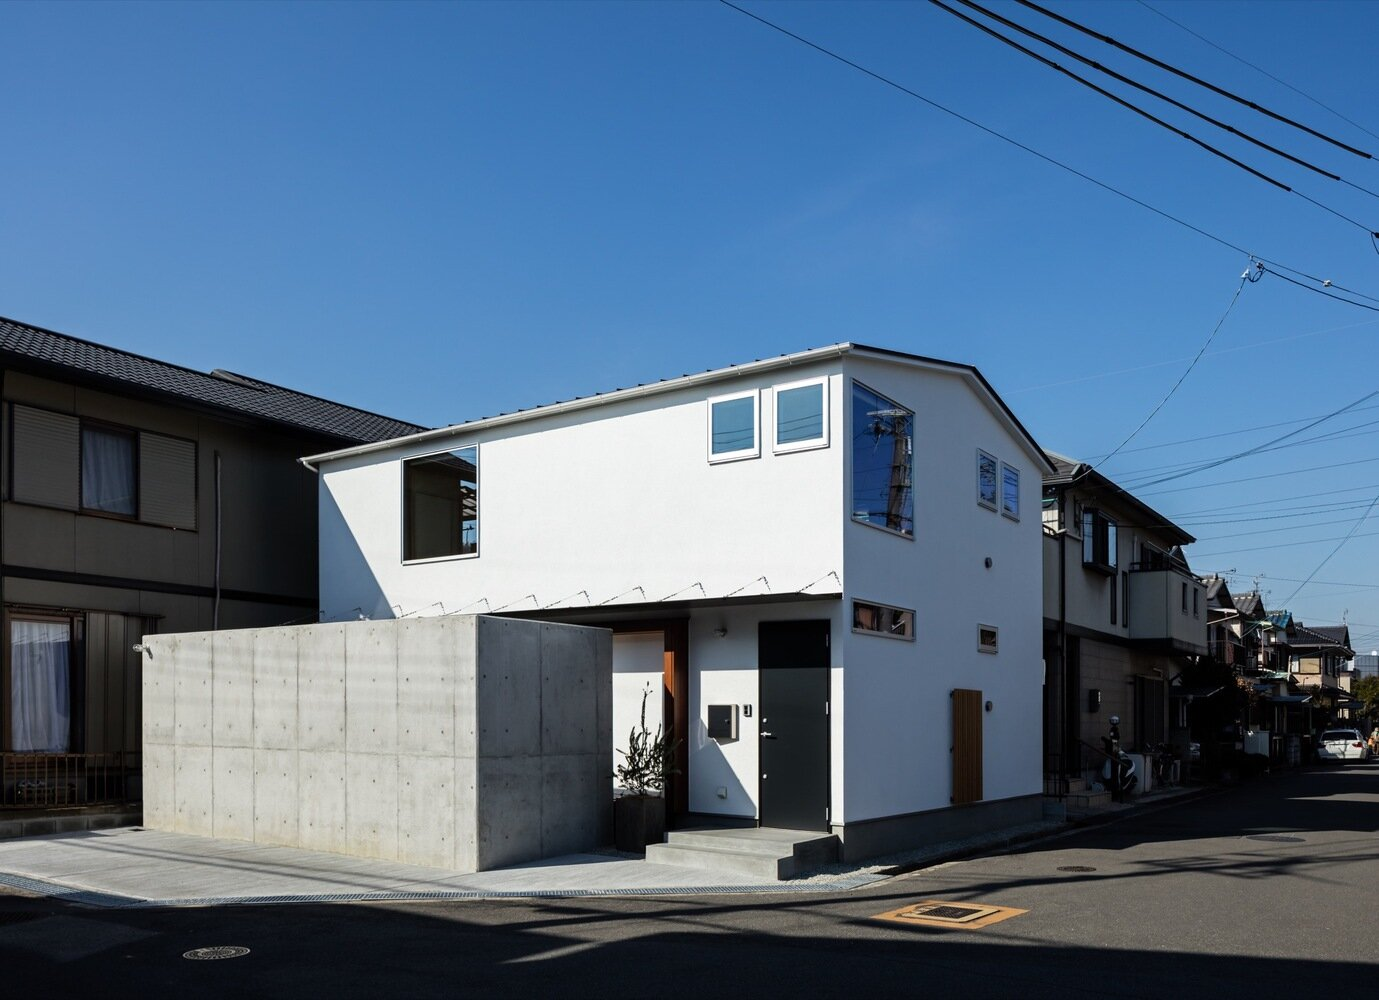 S-House - Coil Kazuteru Matumura Architects - Japan - Exterior - Humble Homes